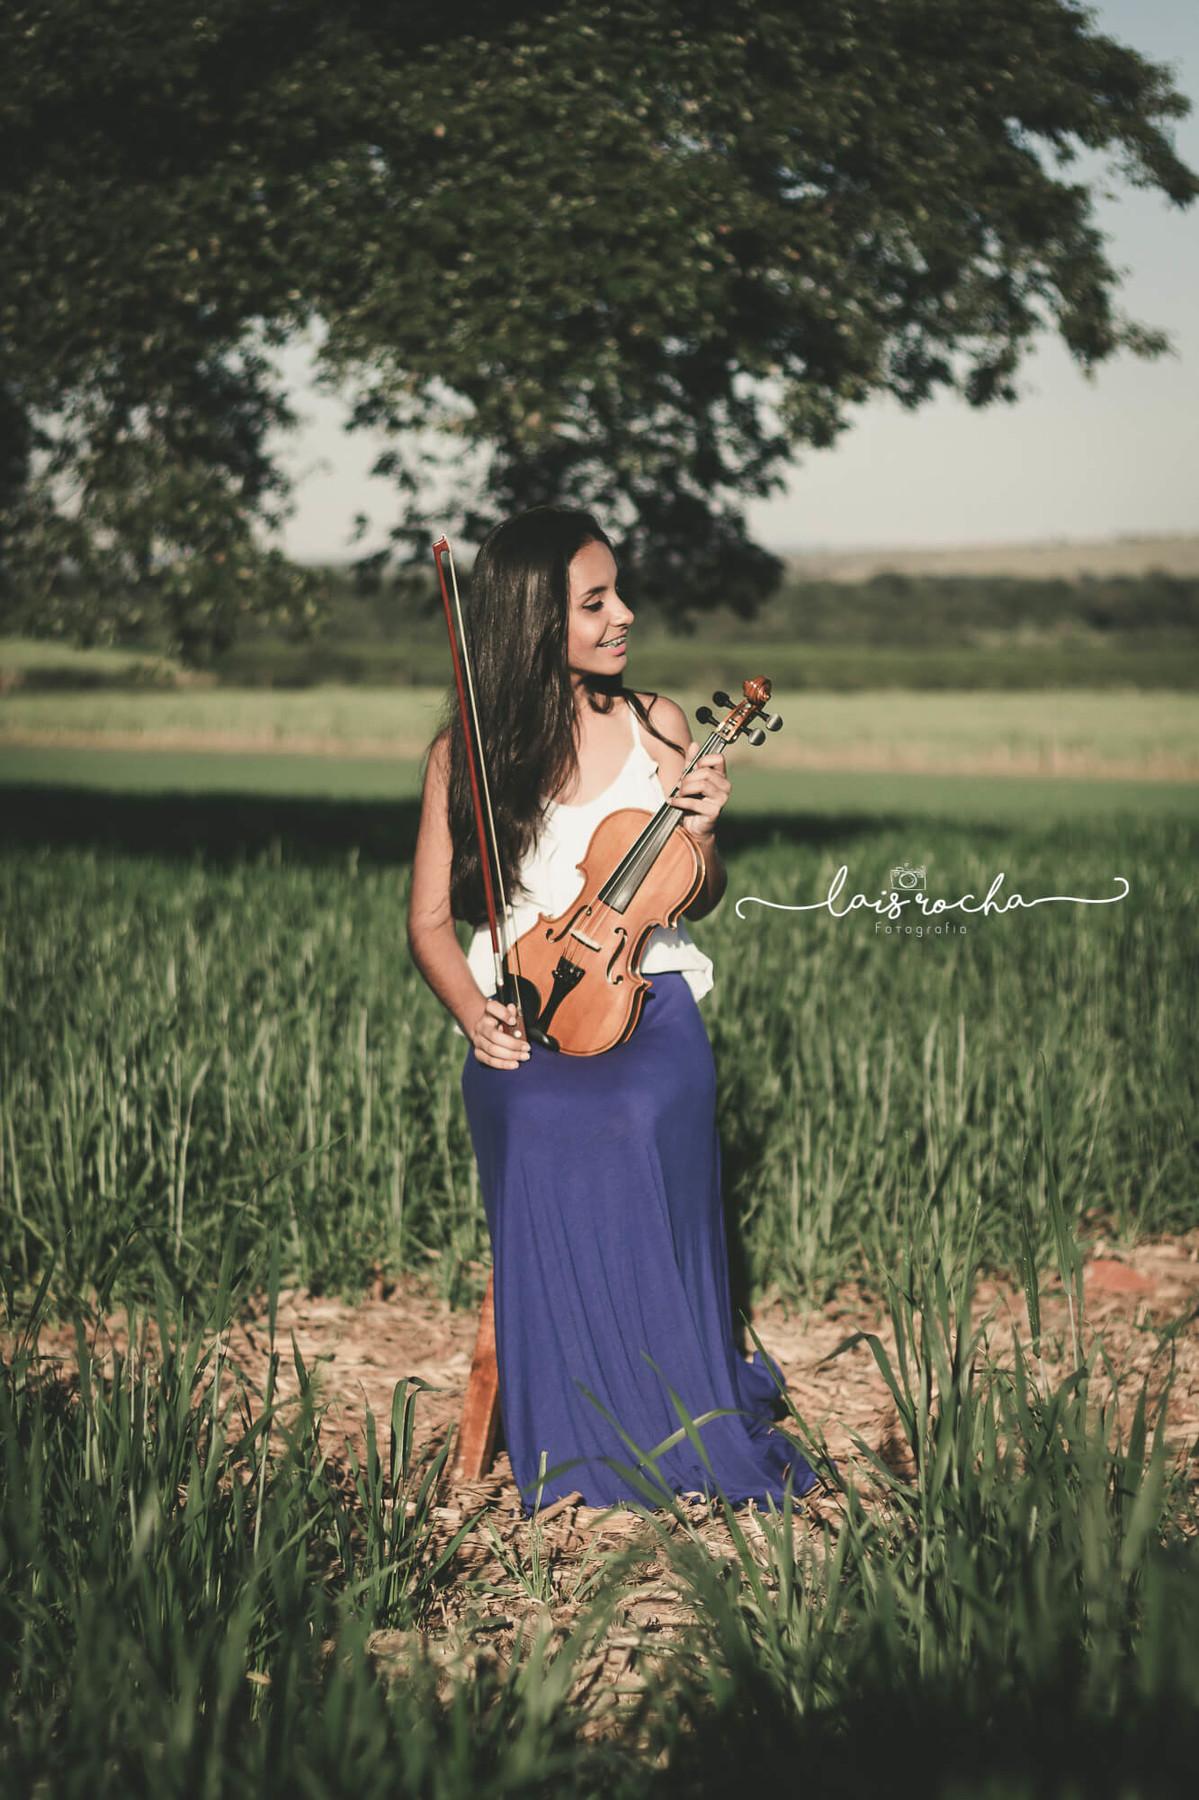 violino - mogi guaçu - lais rocha fotografia - musica - fotografia - feminino - lais rocha photo